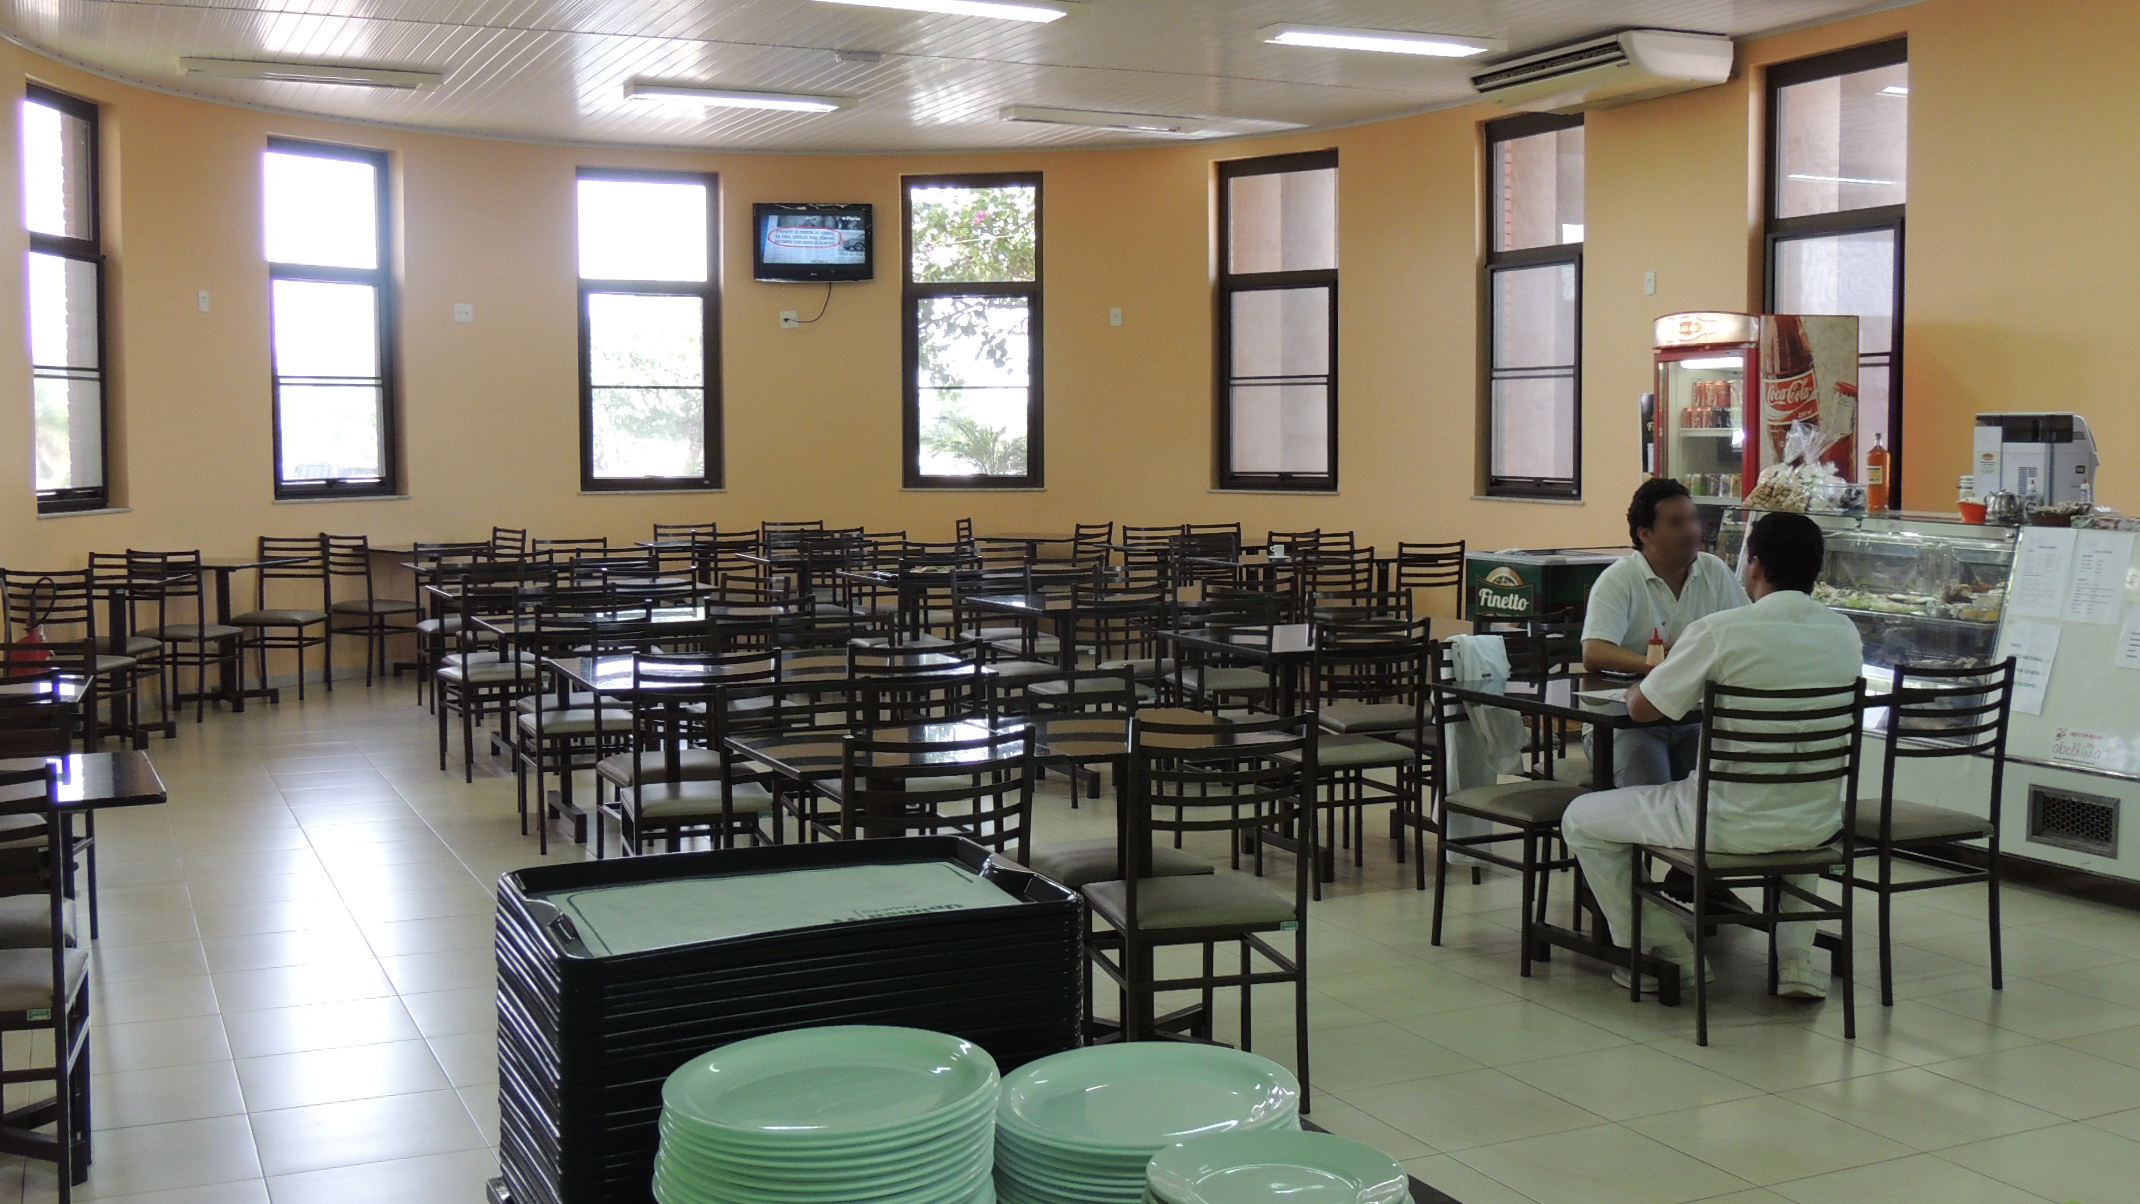 Restaurante - Hospital Unimed de Araçatuba